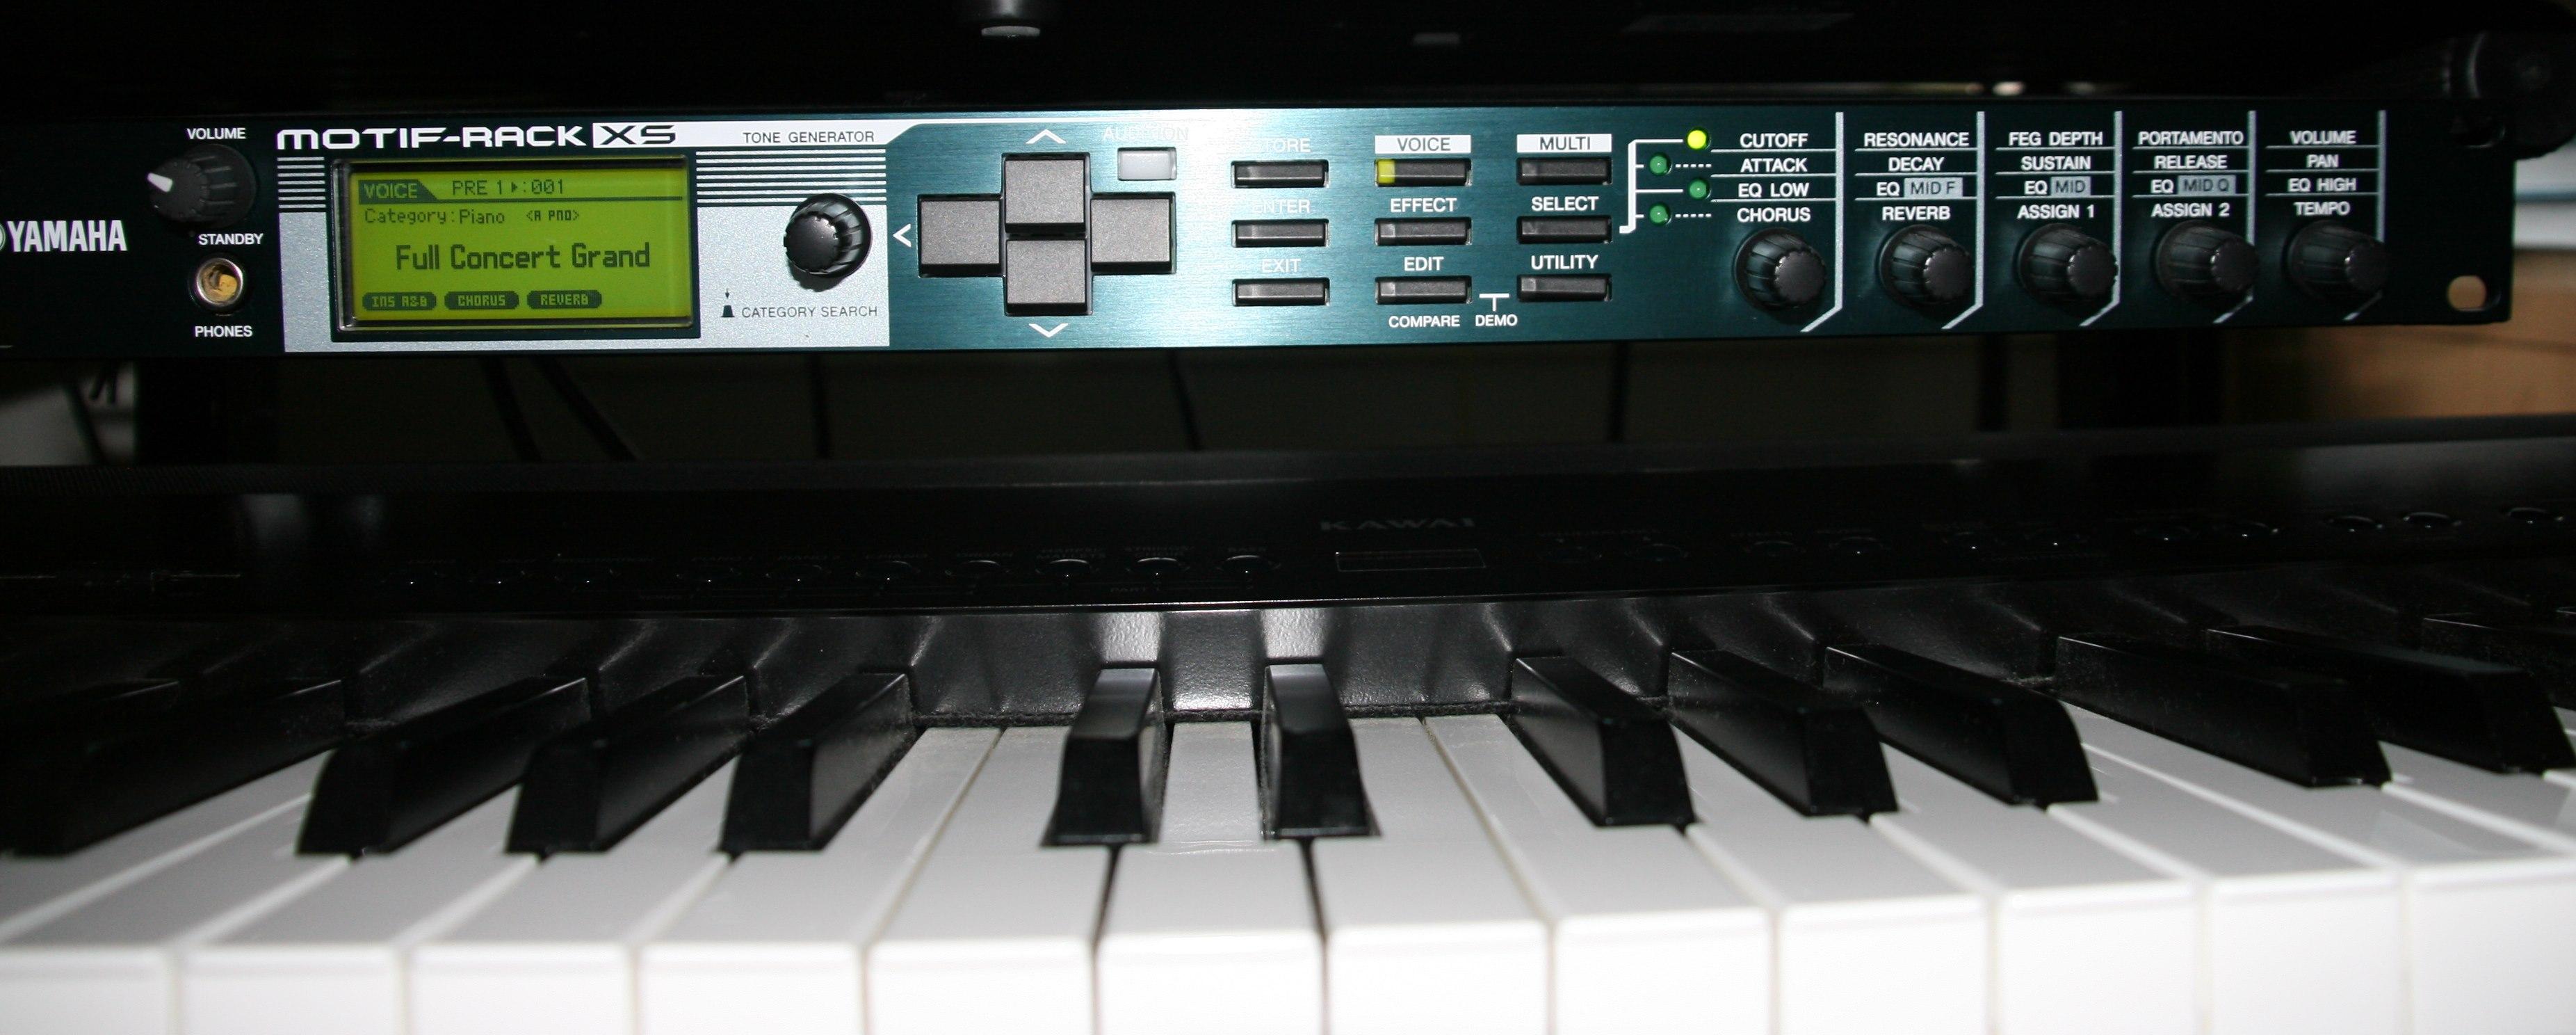 yamaha motif rack xs image 760752 audiofanzine. Black Bedroom Furniture Sets. Home Design Ideas